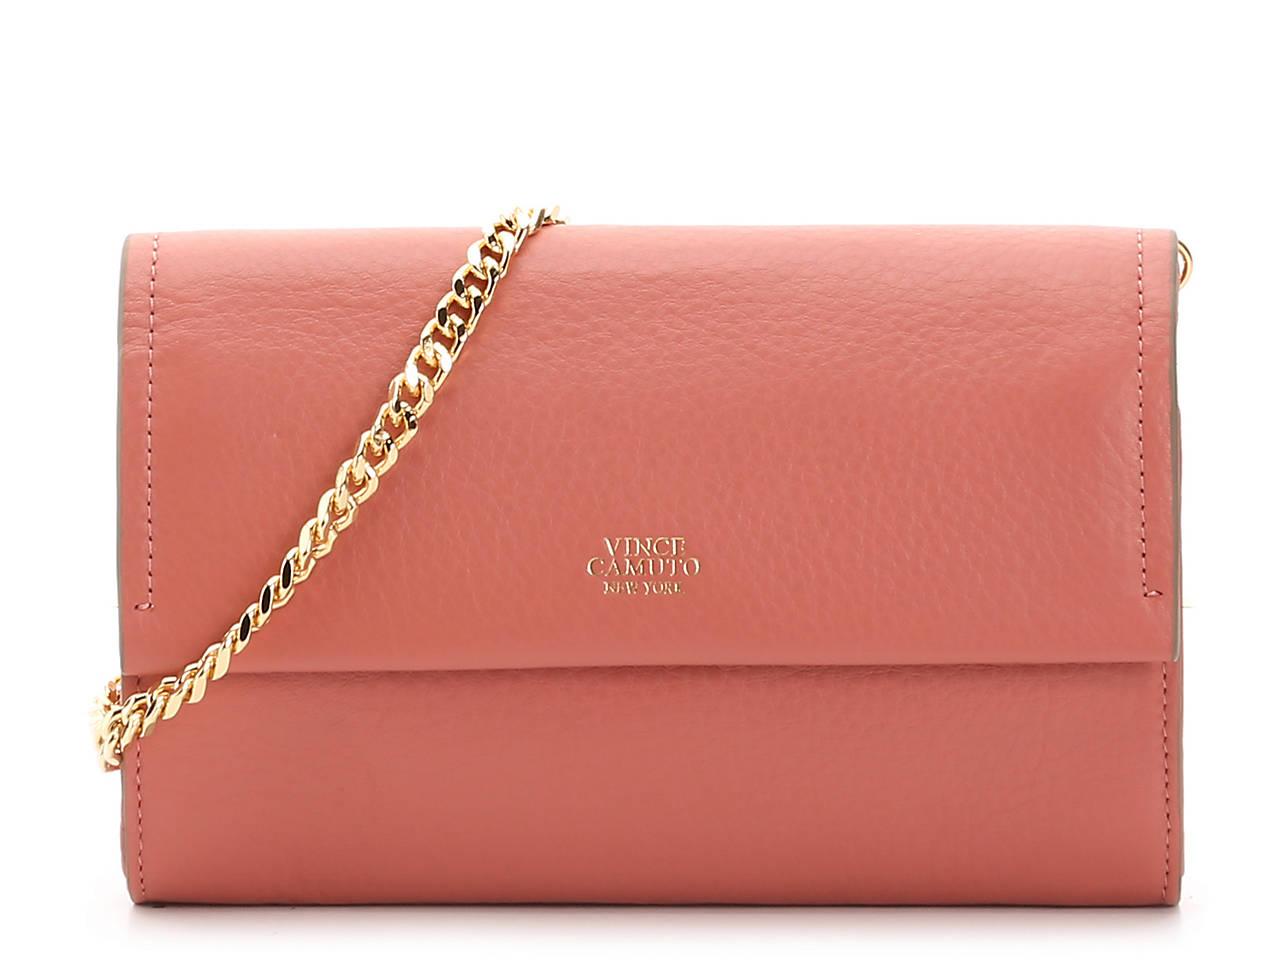 dbd3dde20 Vince Camuto Zosia Leather Crossbody Bag Women's Handbags ...